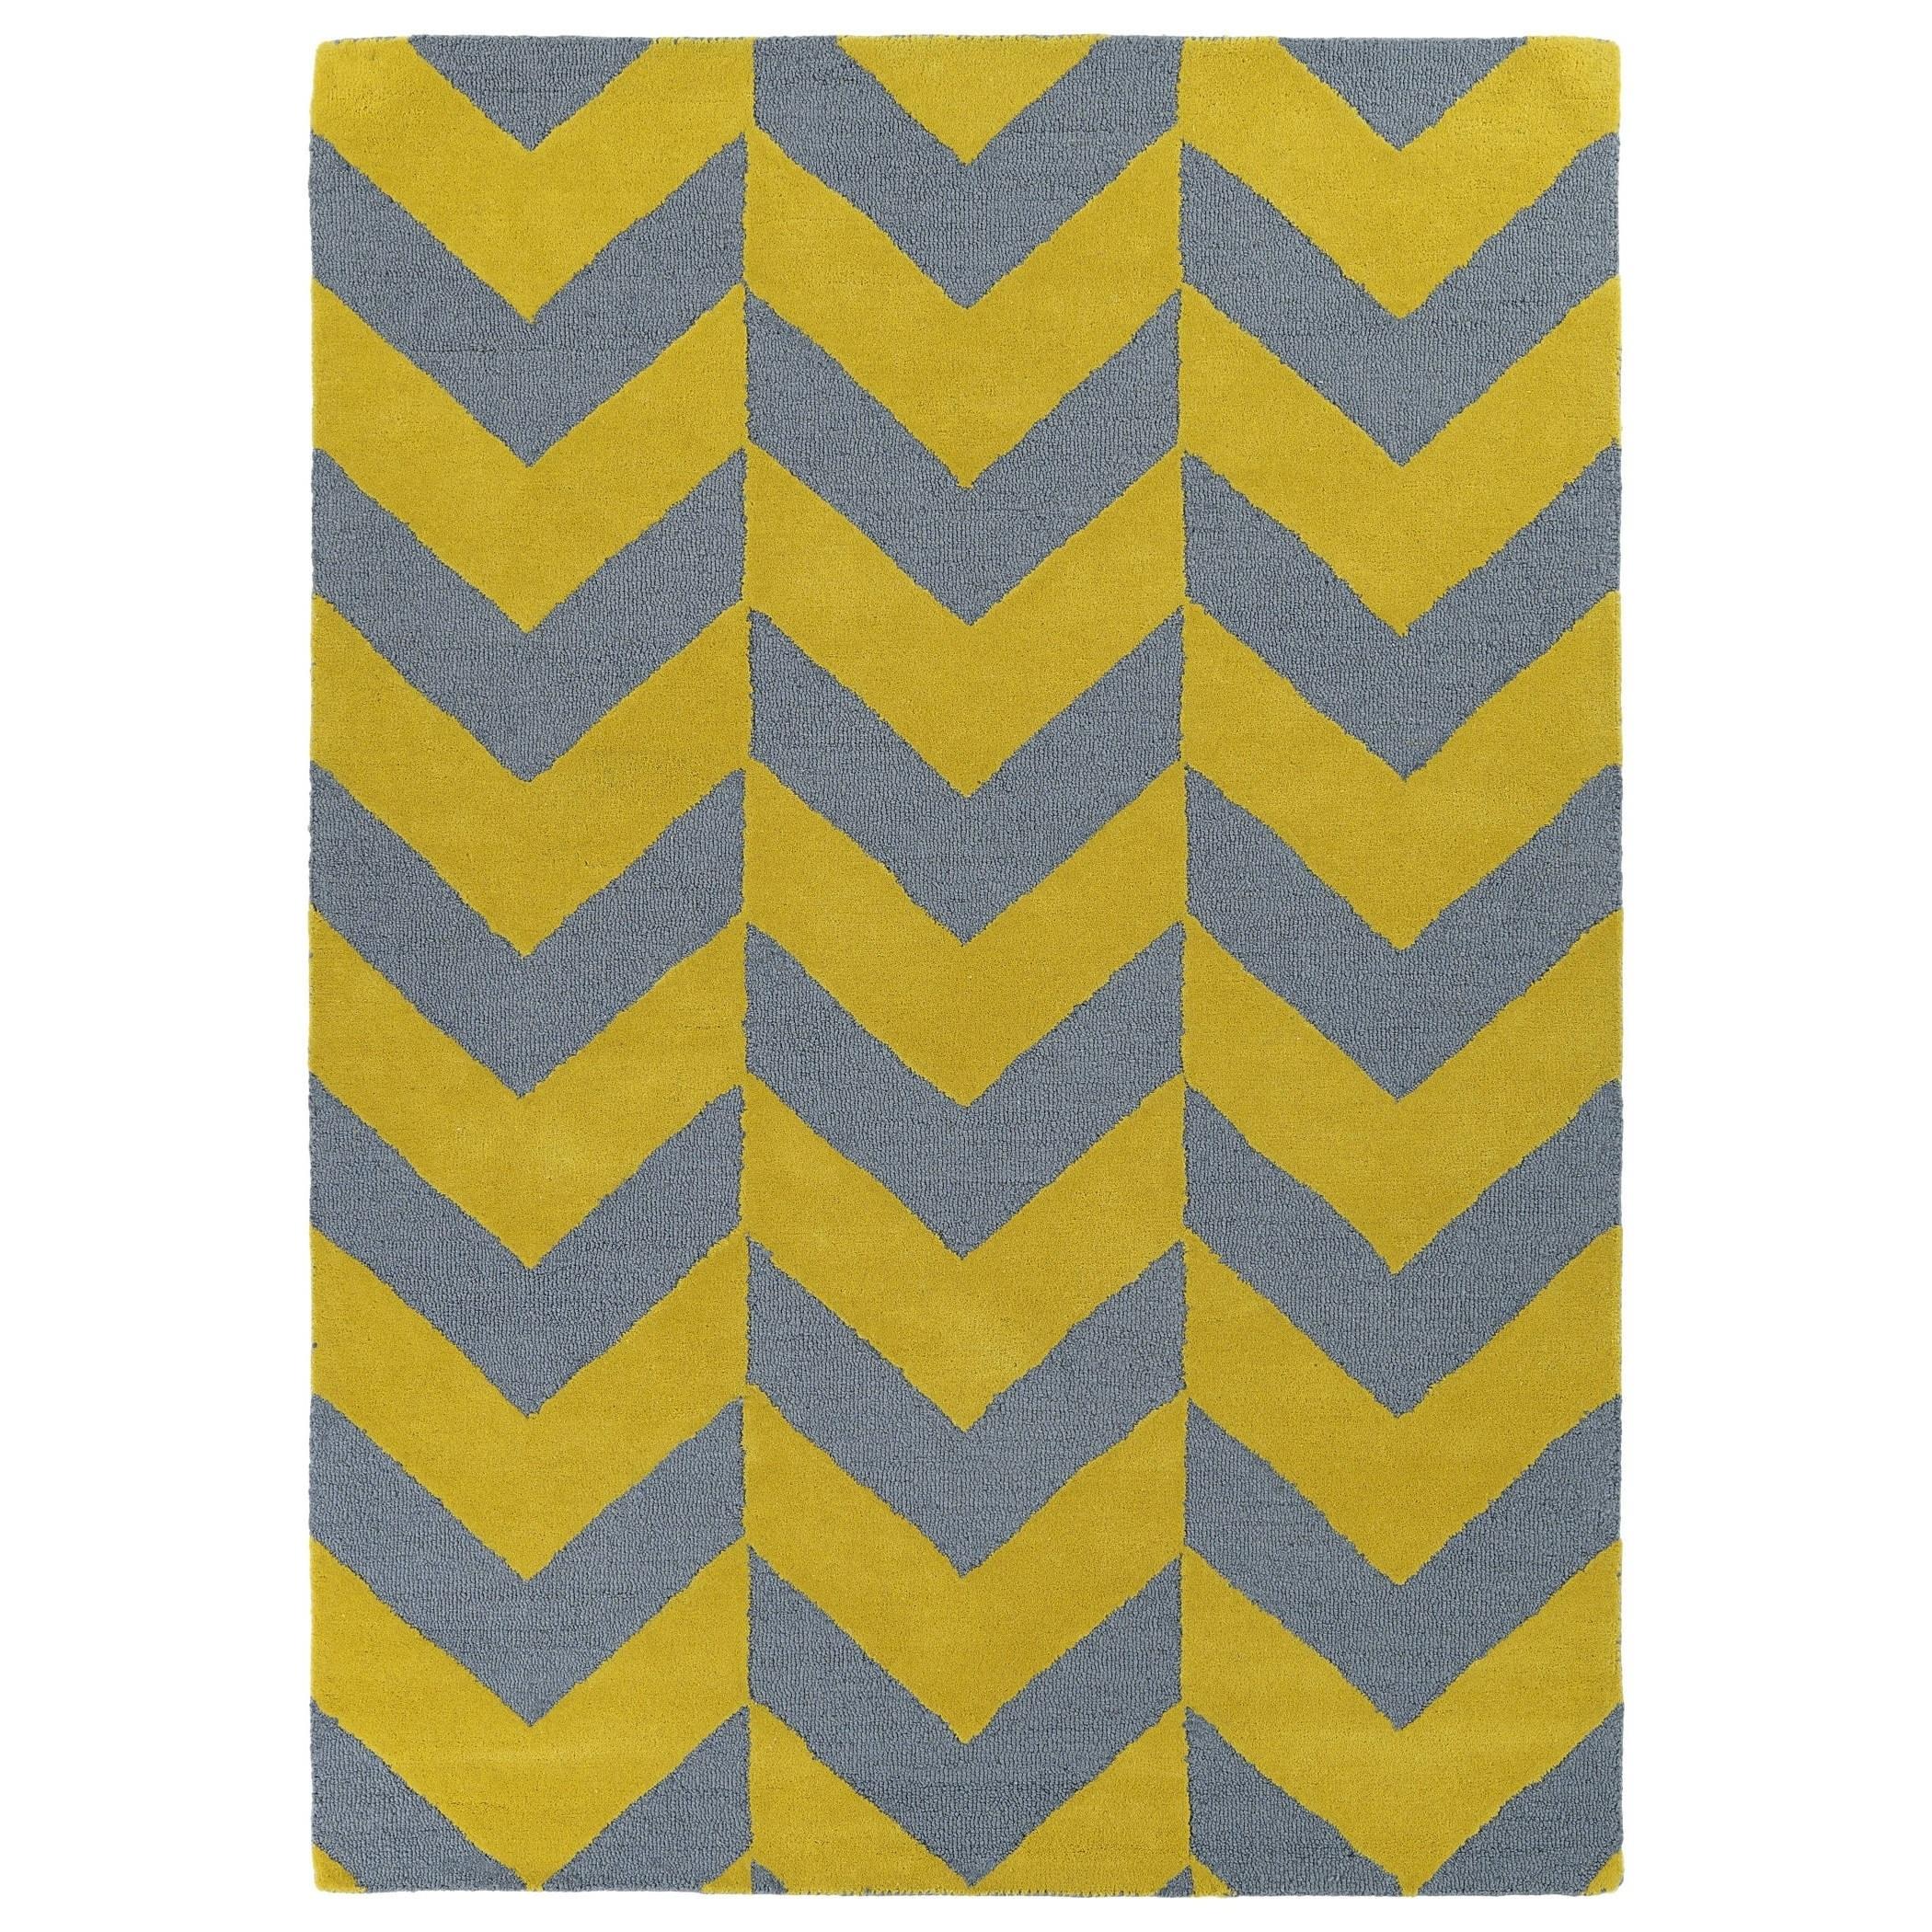 Hand Tufted Grey Yellow Prints